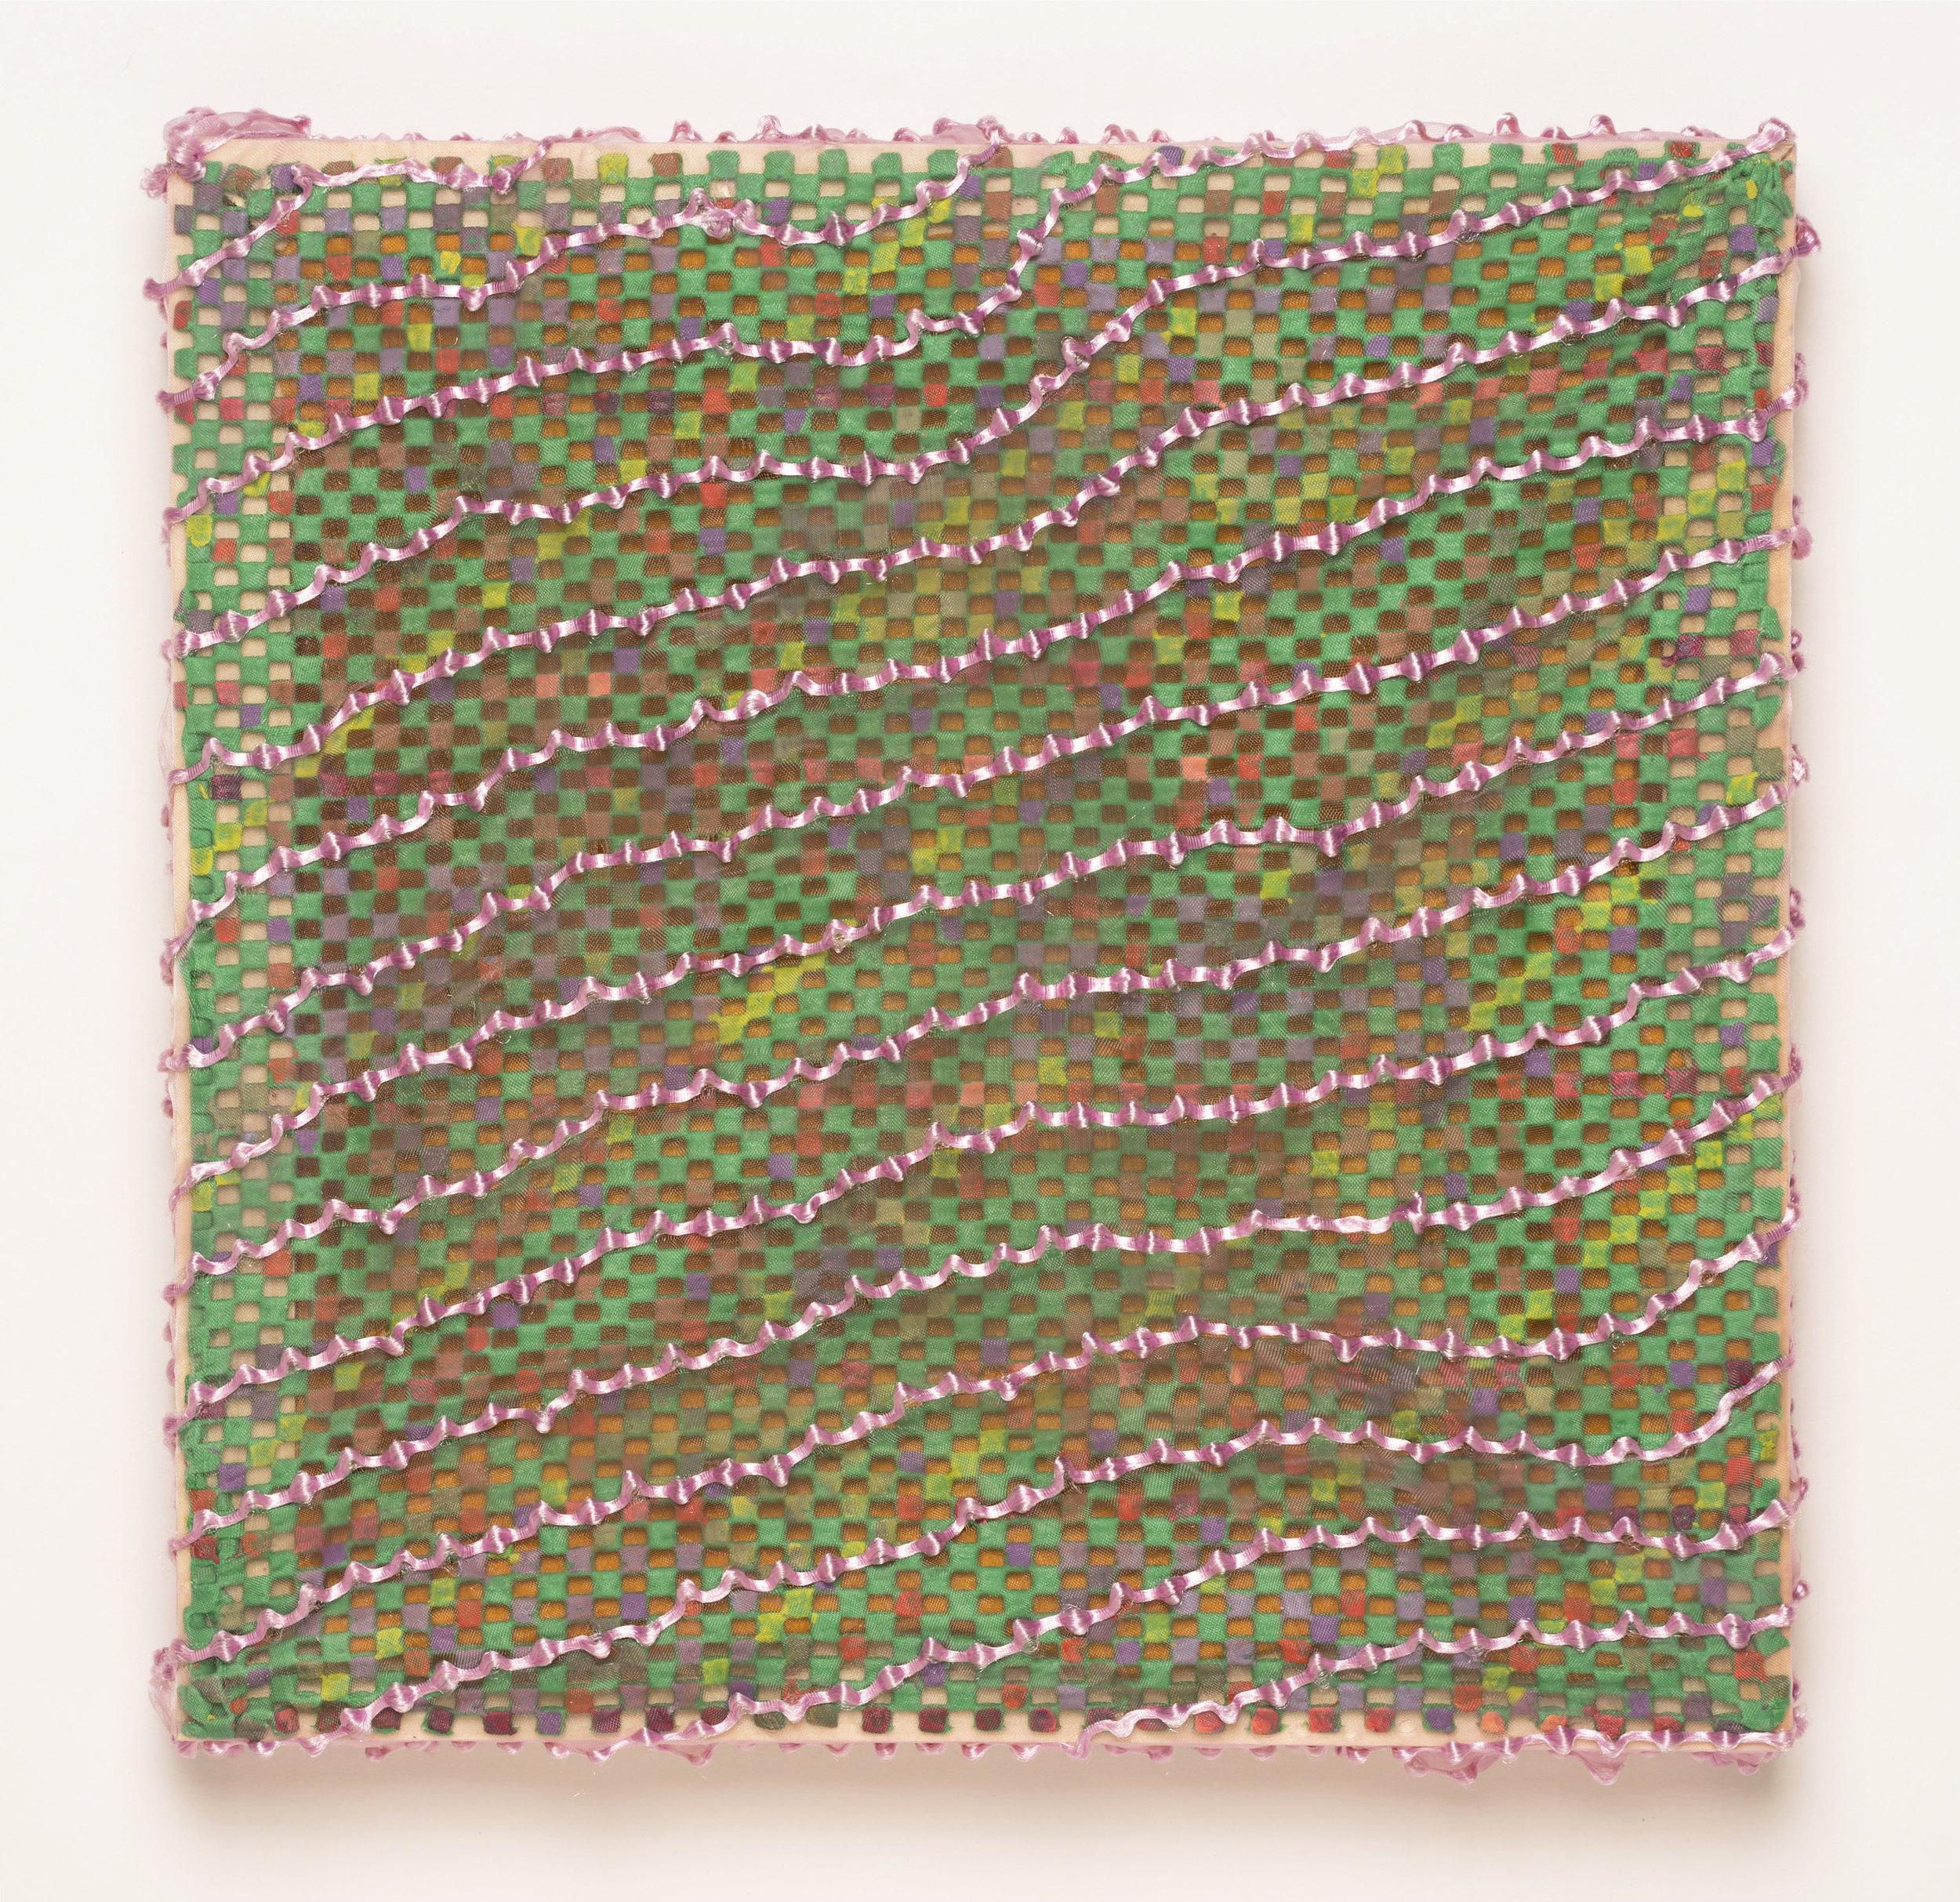 "Second Floor Window Ledge    2017  Acrylic paint, plush rug pad, fabric.   10"" x 10"""